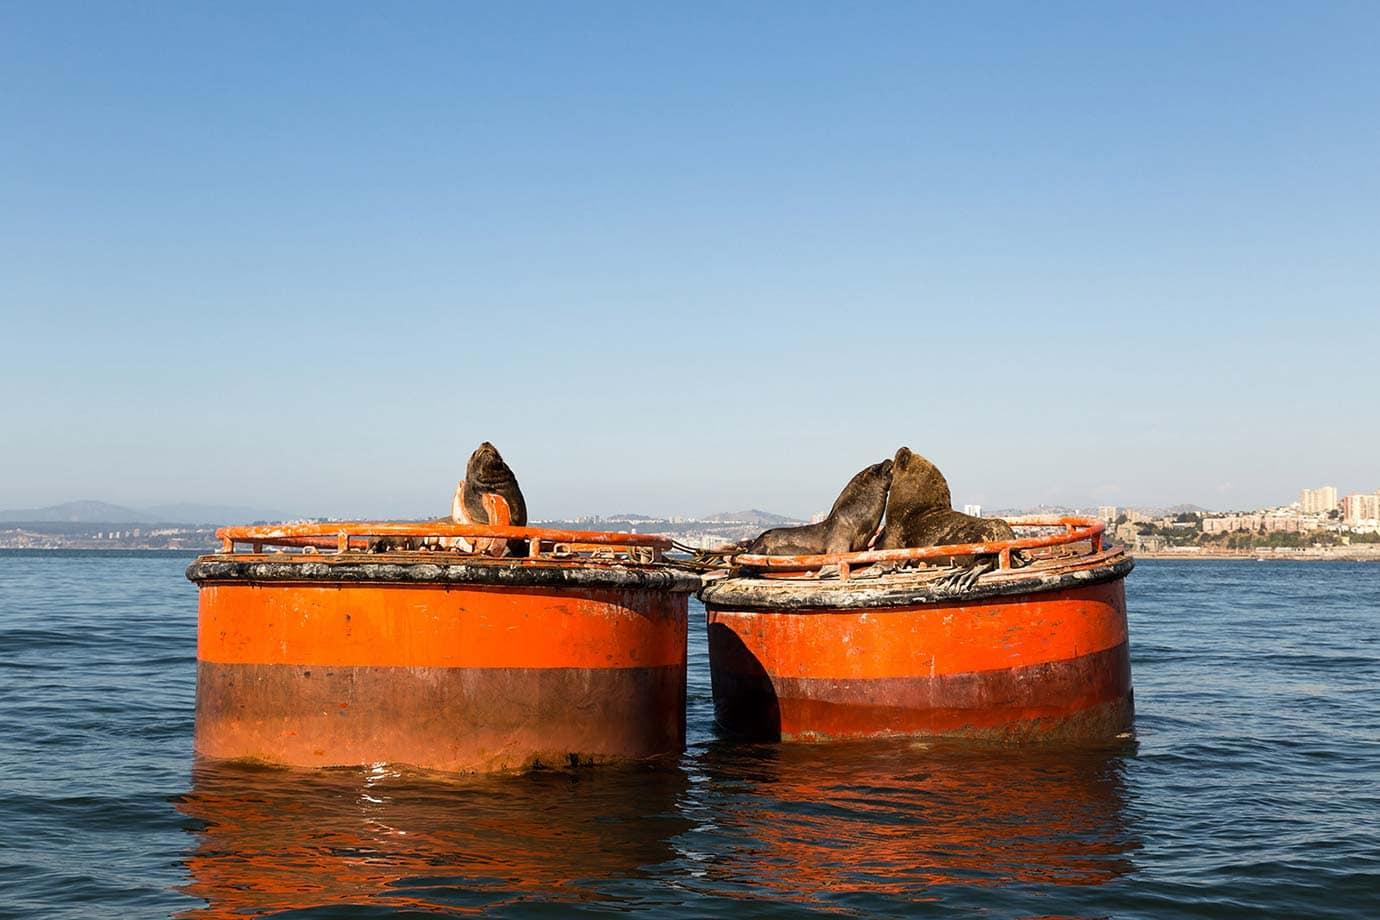 Sea lions in Valparaiso